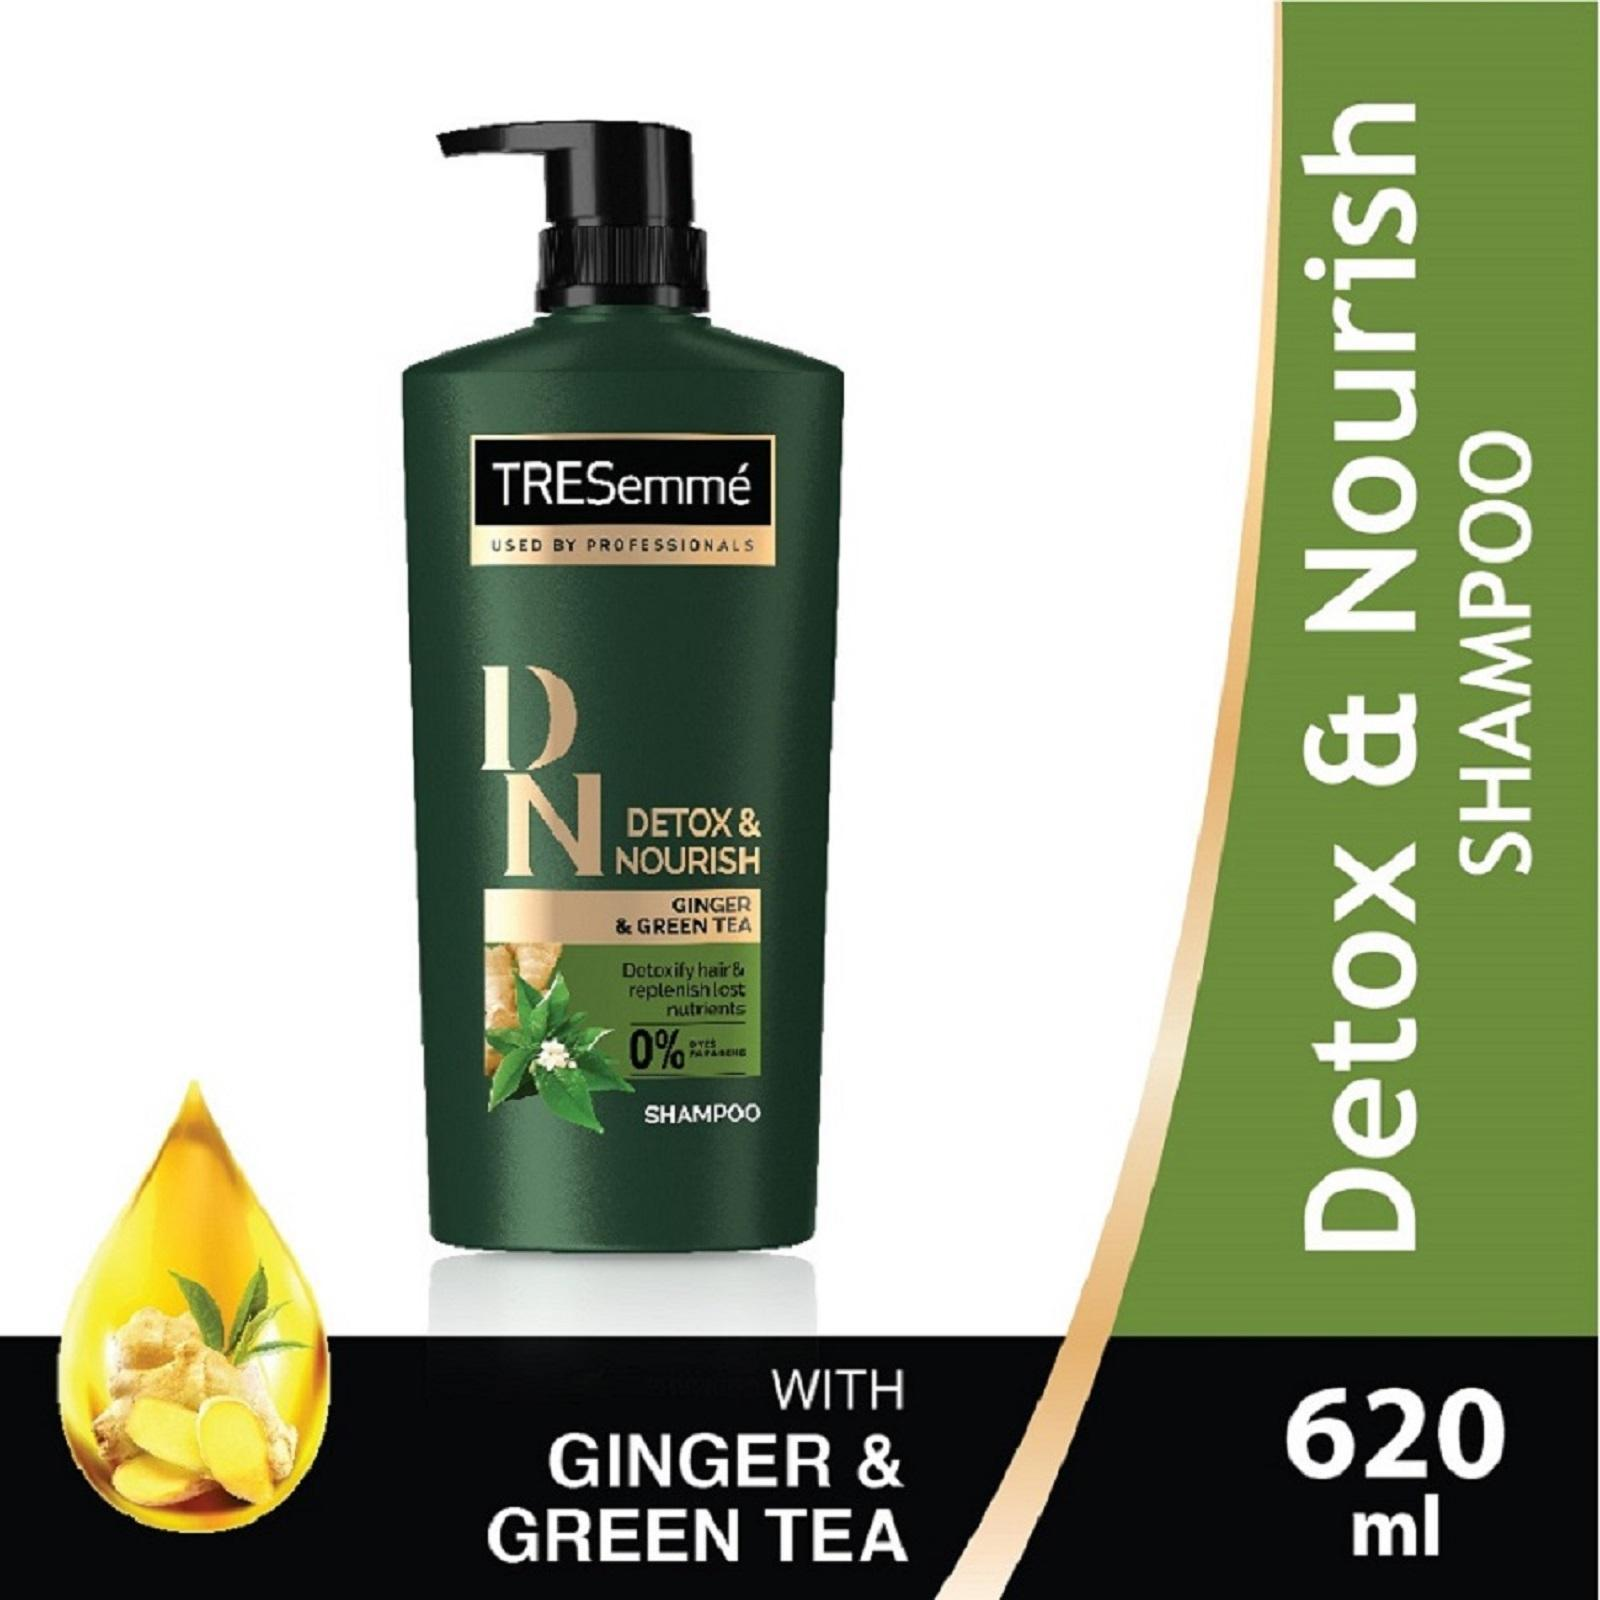 TRESemme Detox and Nourish Shampoo